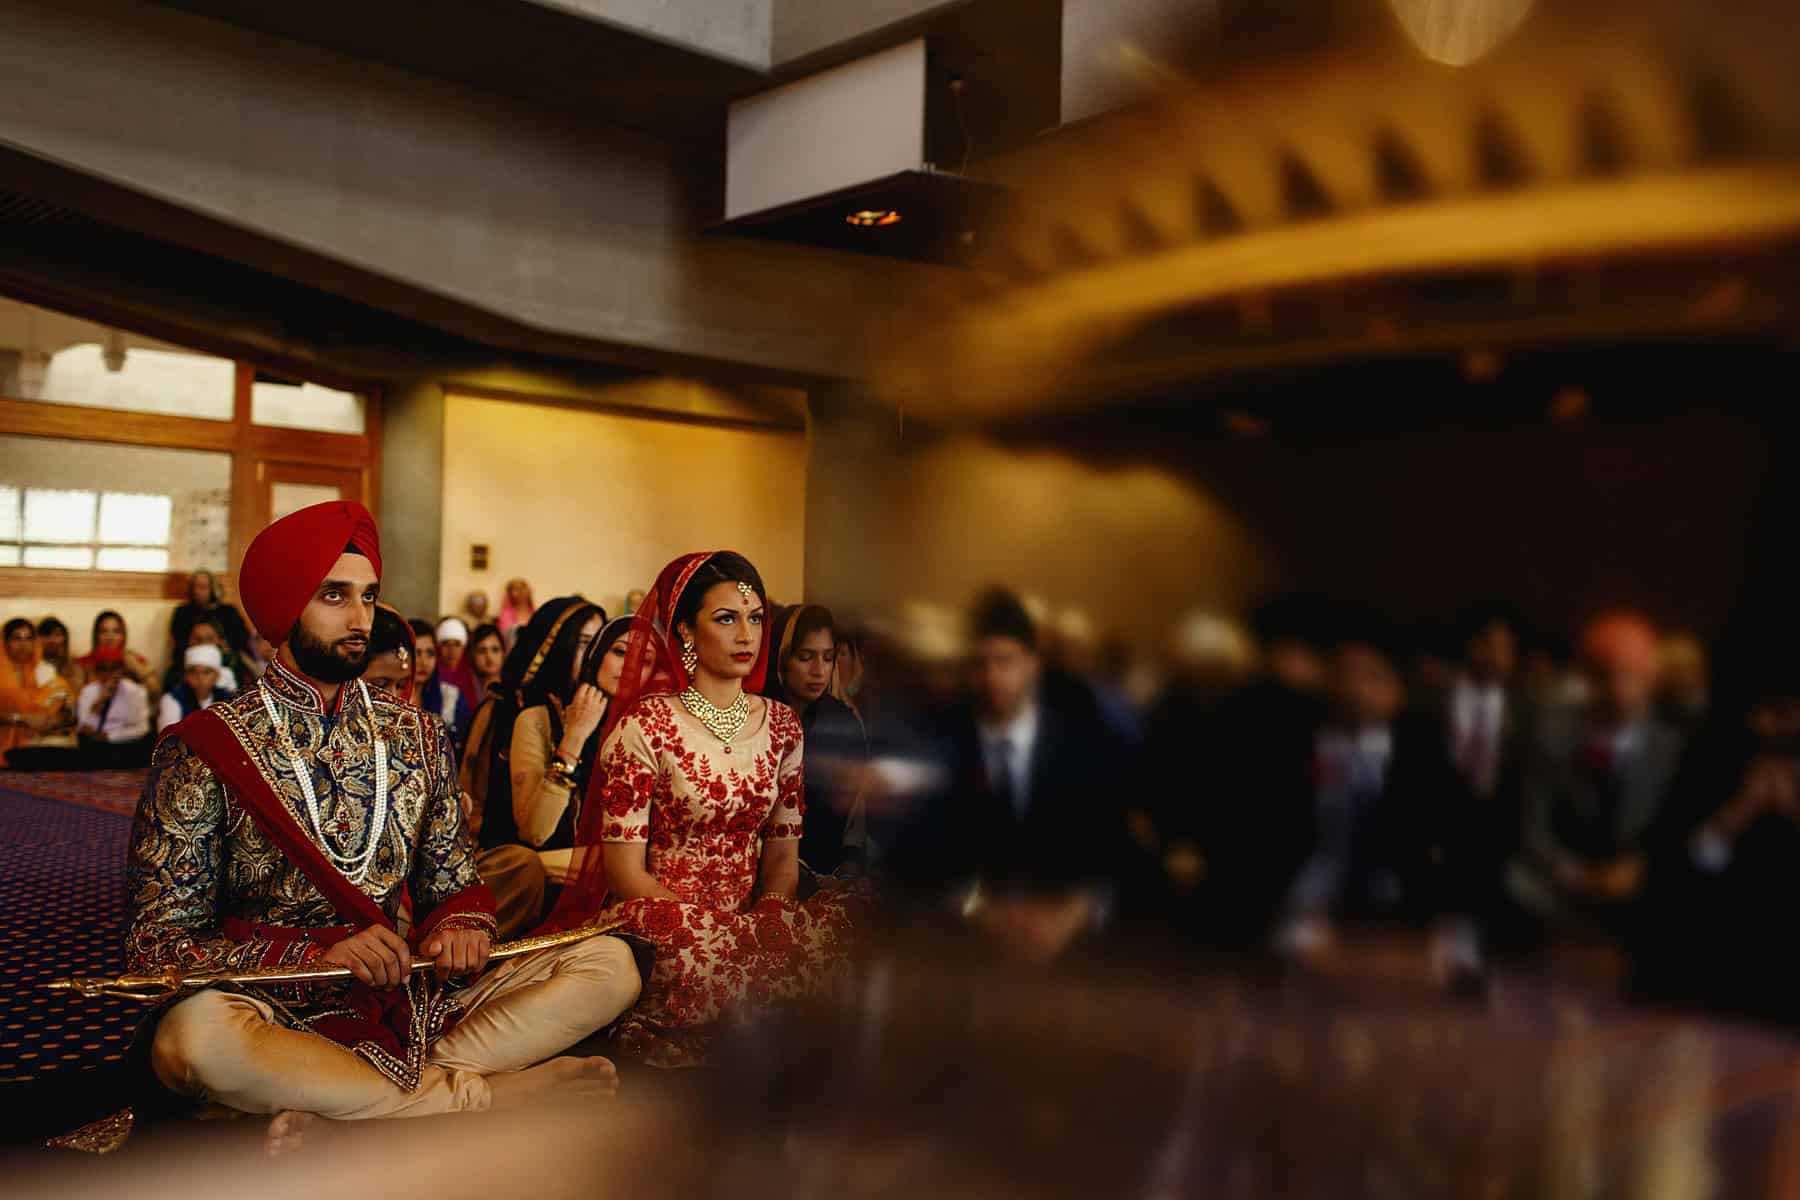 havelock road gurdwara wedding